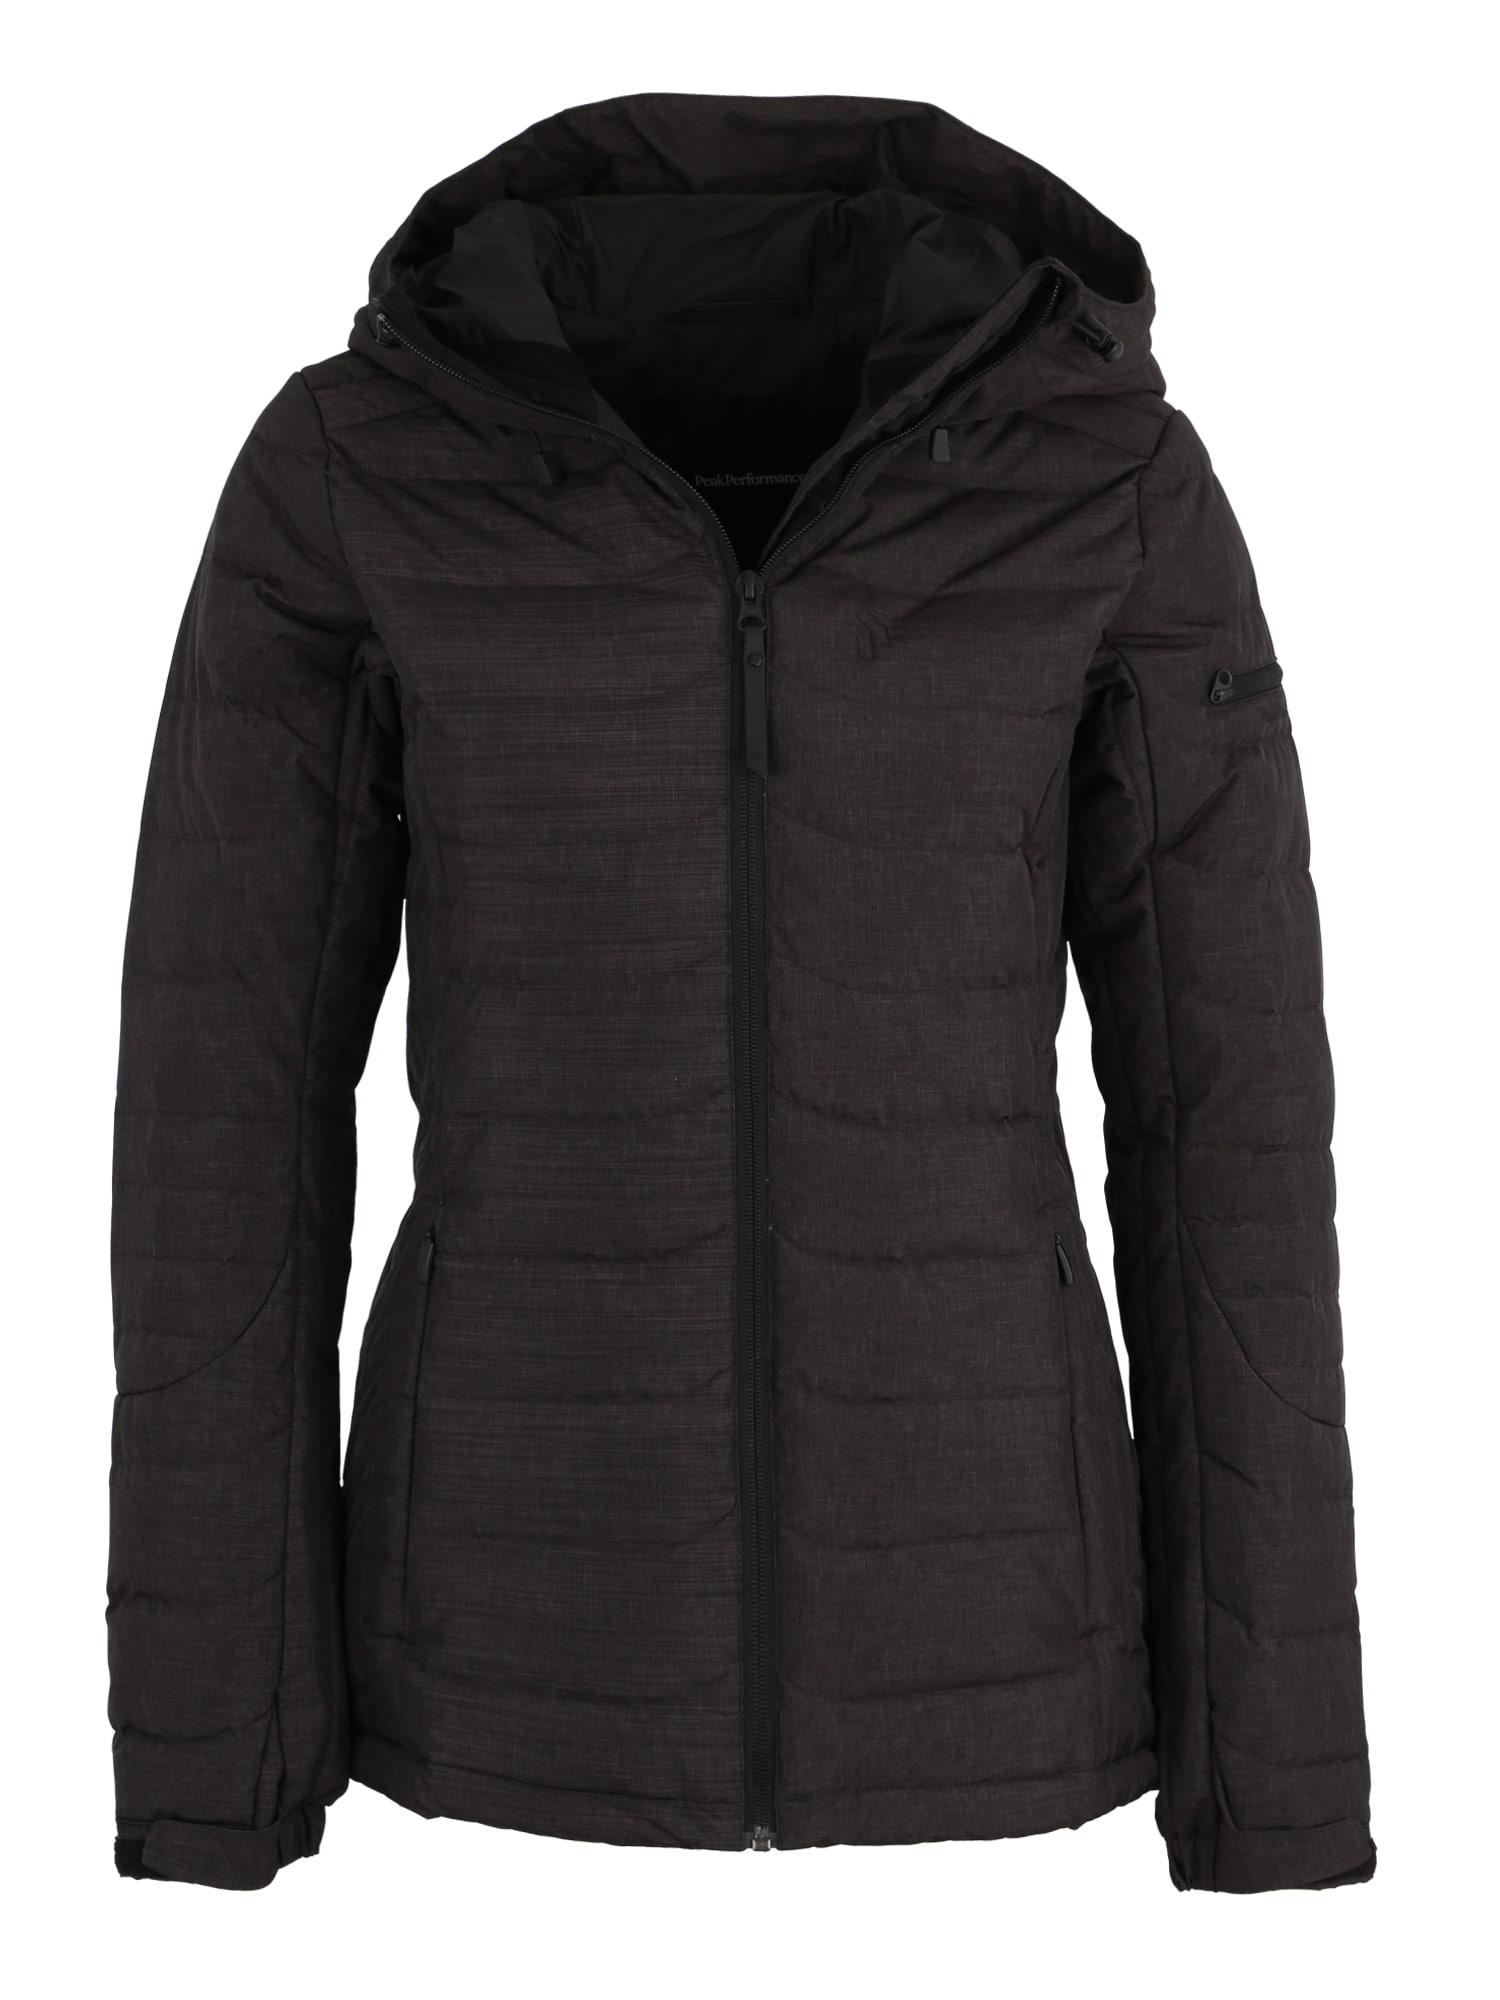 Sportovní bunda W BLACK J černý melír PEAK PERFORMANCE